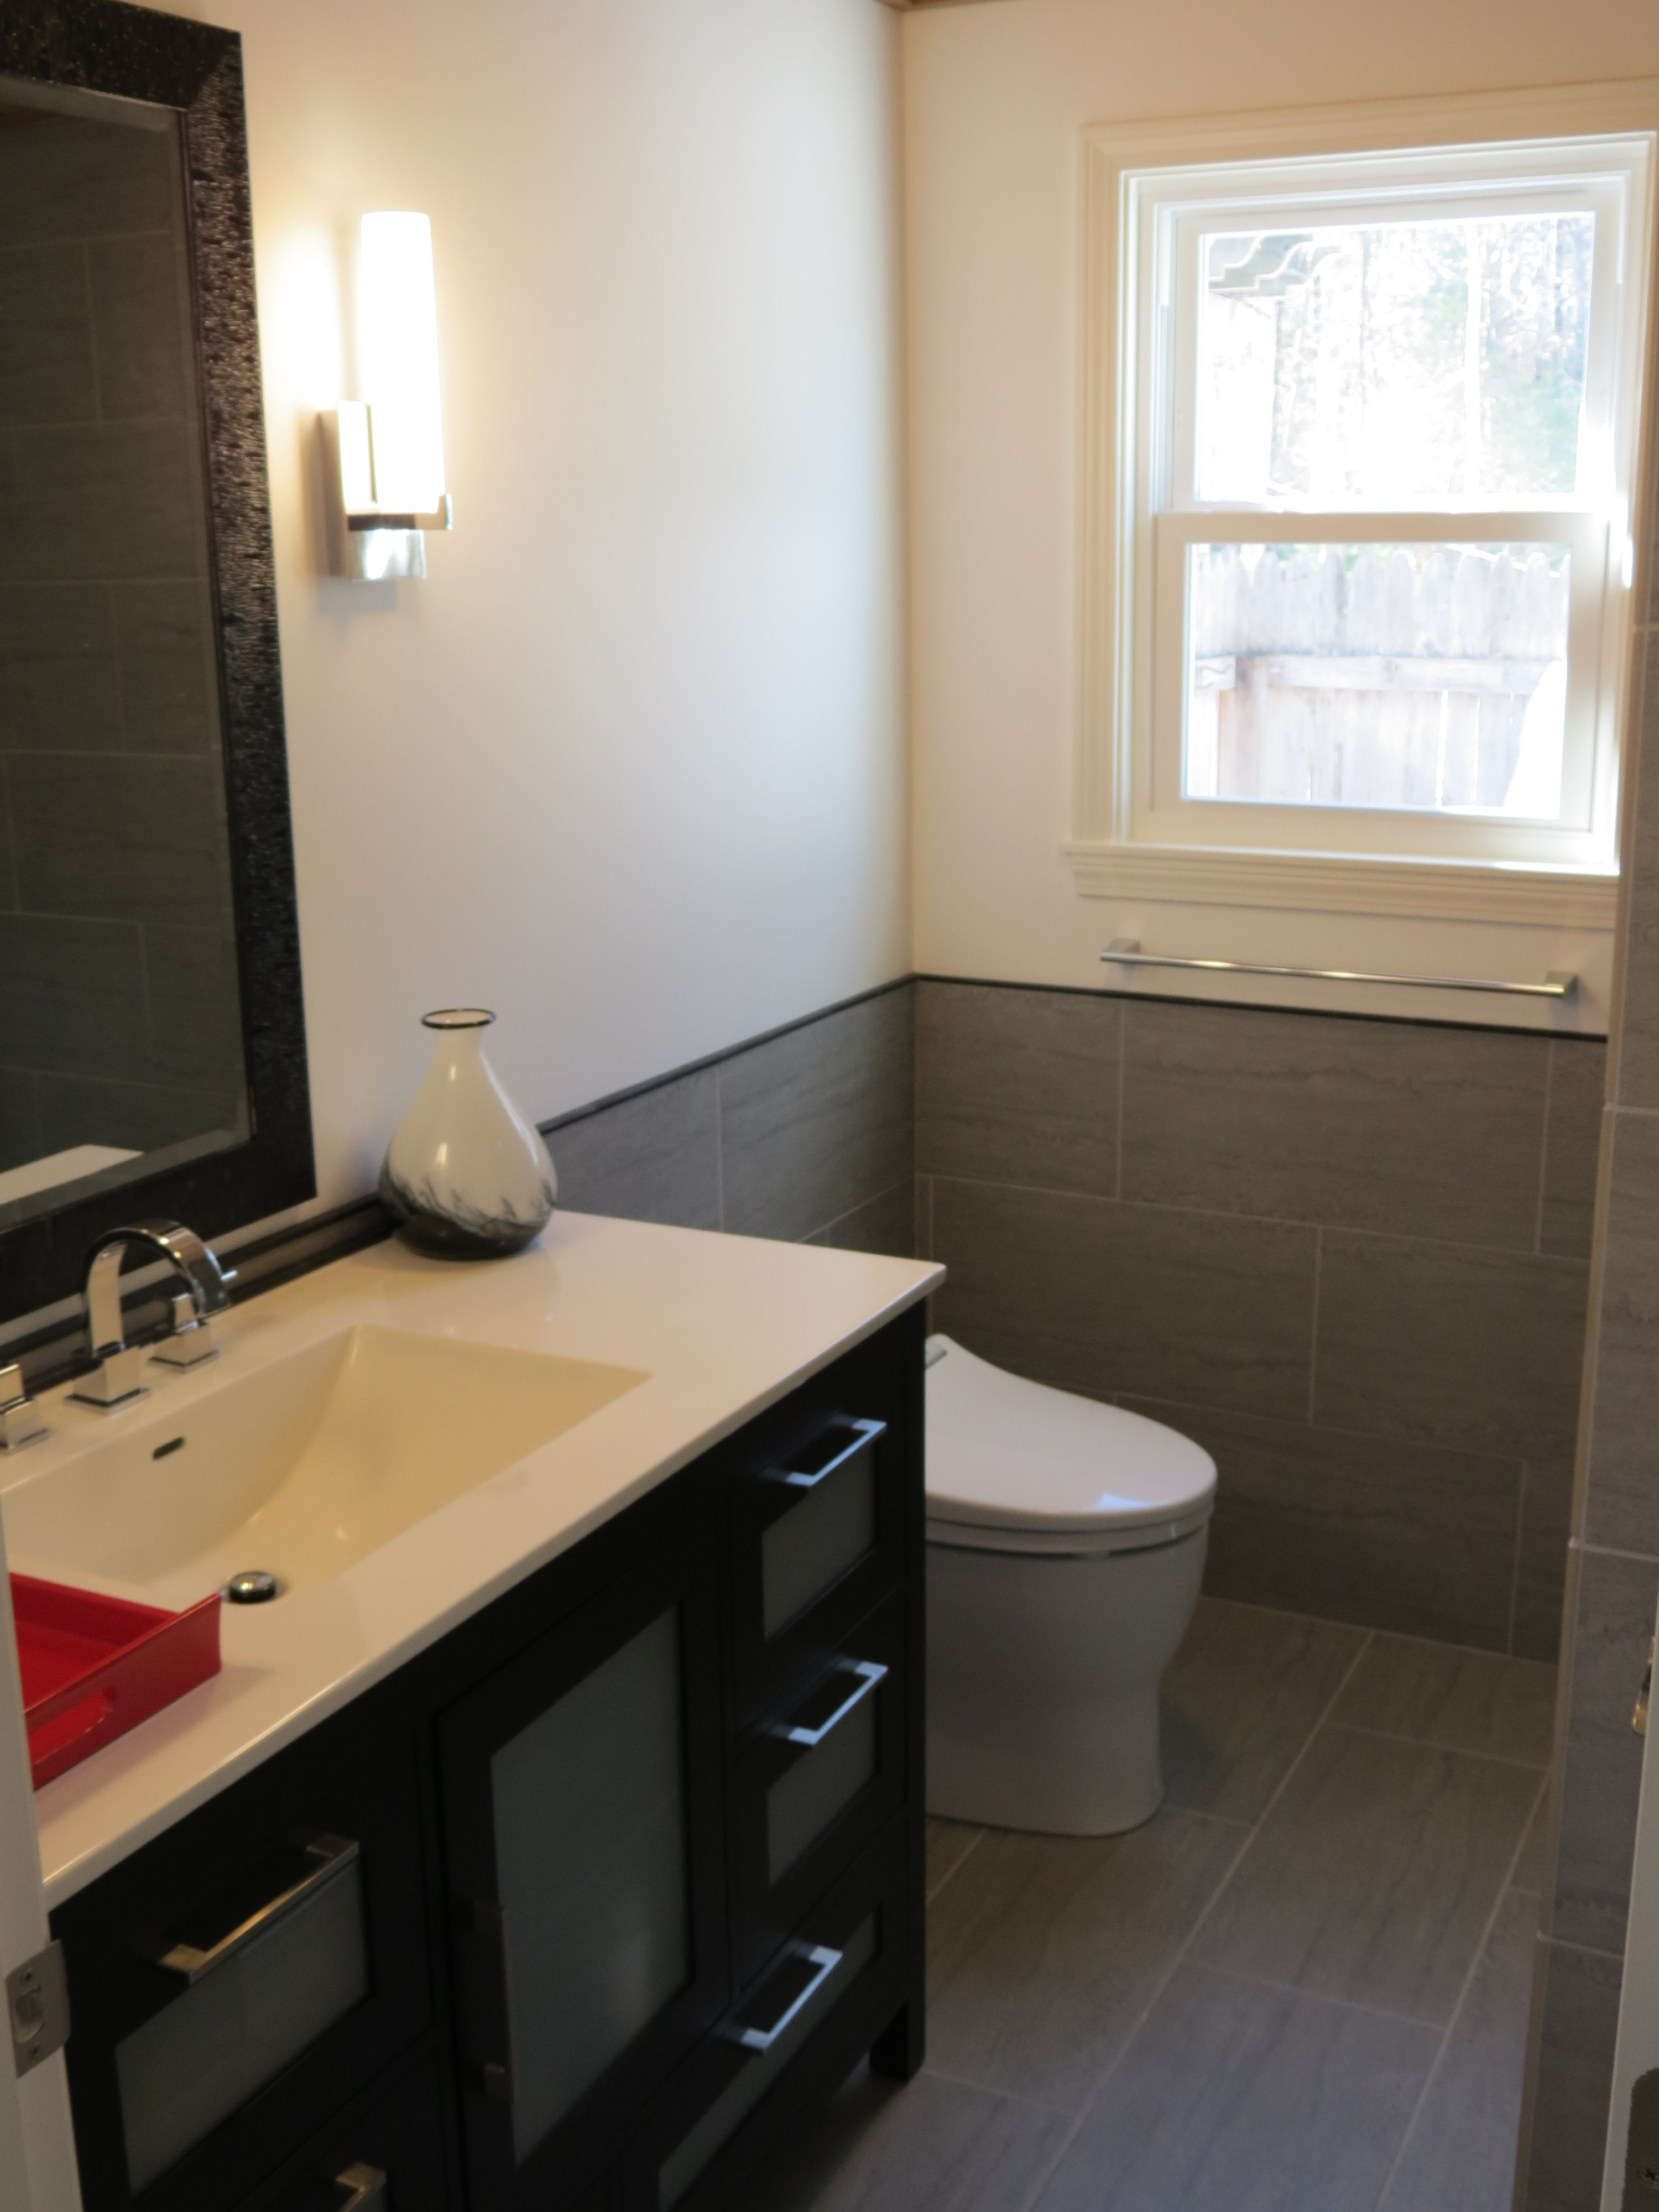 Tiled Bathroom Half Wall february 2013 - bathroom reno - ronbow vanity, toto toilet, delta